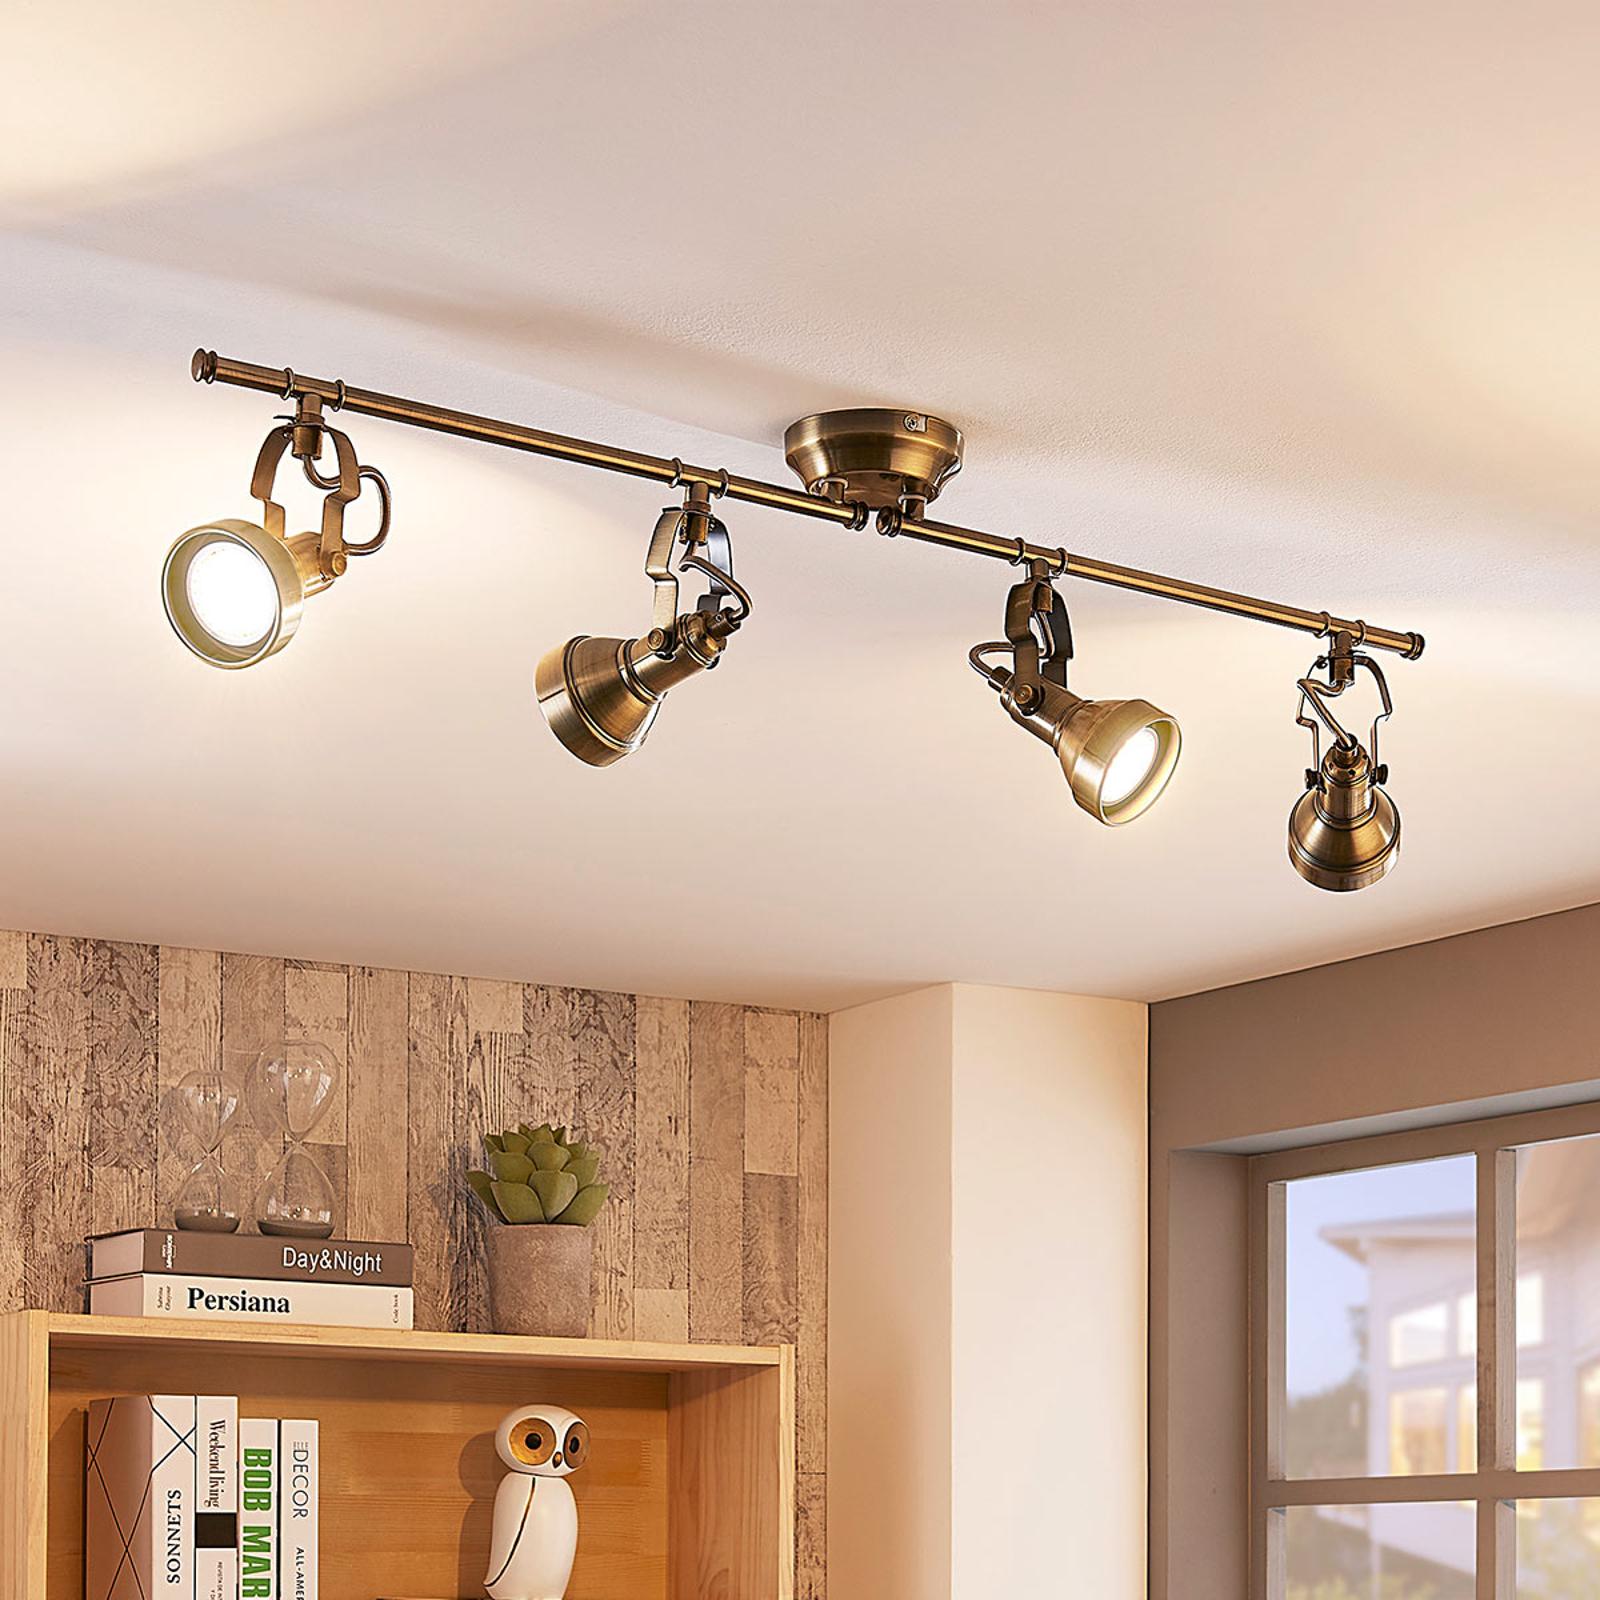 Podłużna lampa sufitowa PERSEAS, LED GU10